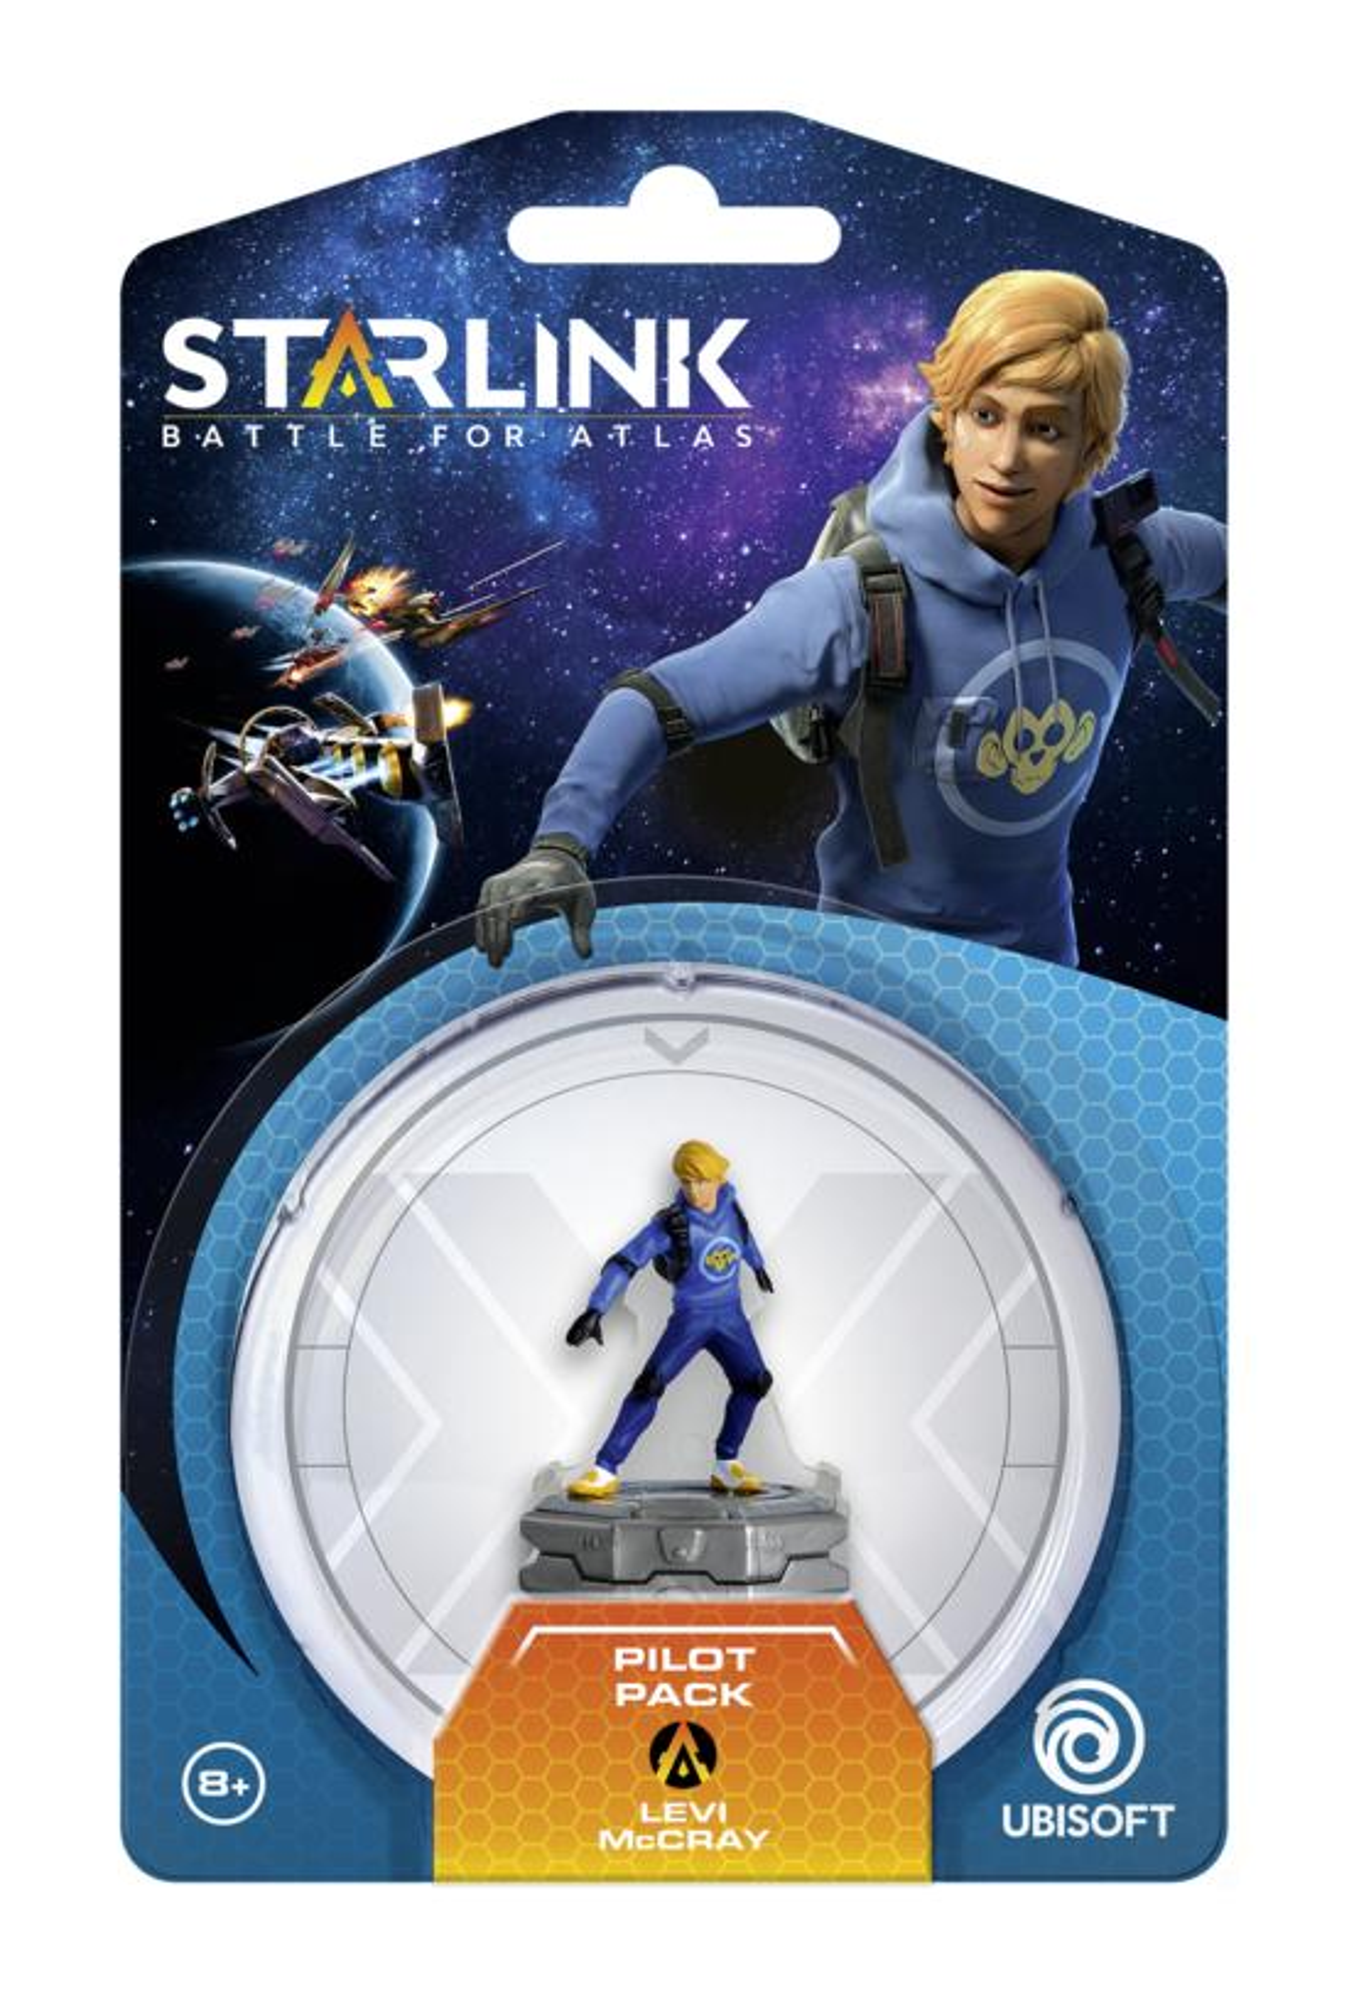 Starlink: Battle for Atlas - Pacchetto Pilota (Levi McRay)